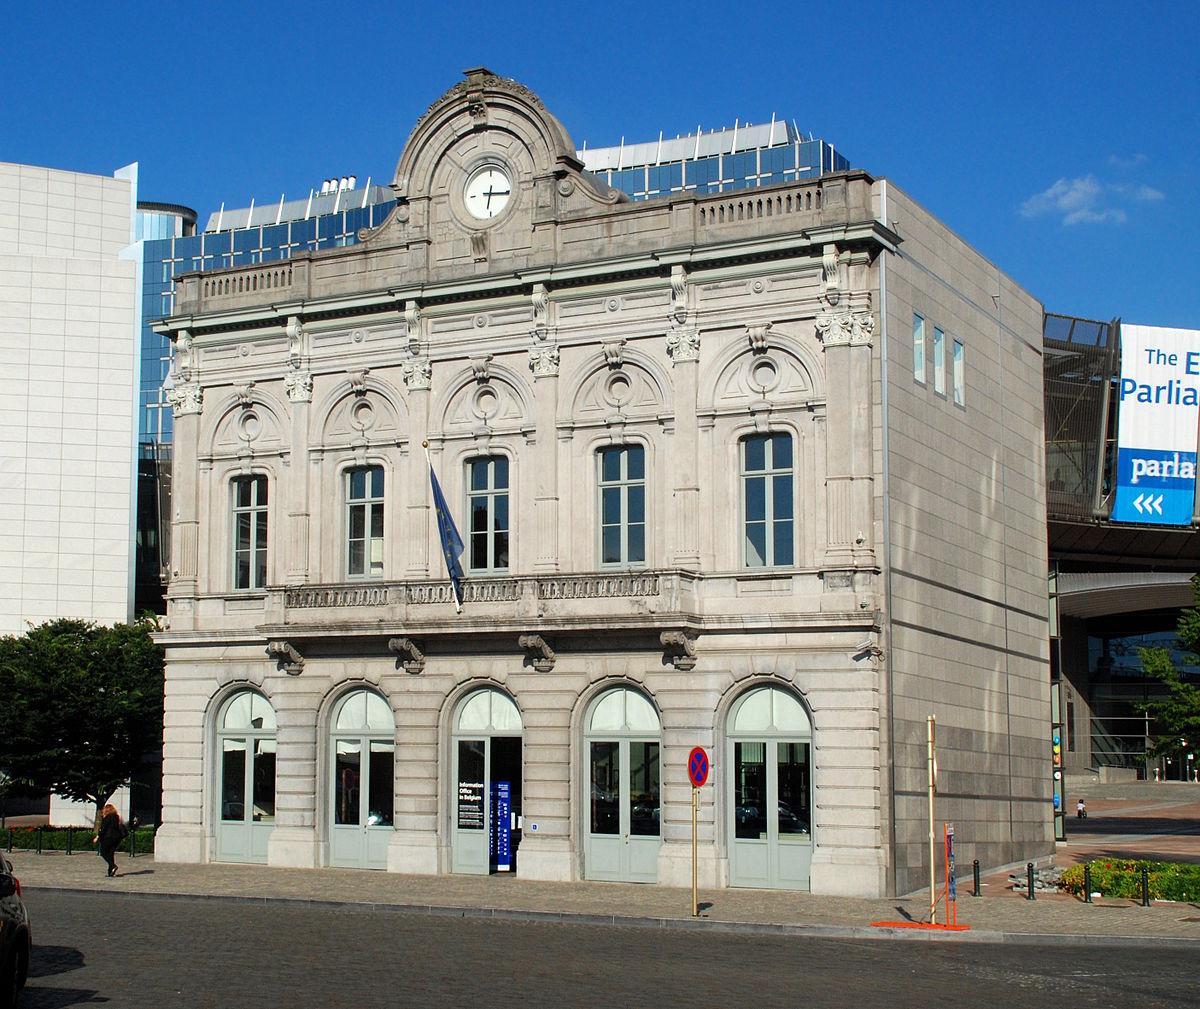 Gare de bruxelles luxembourg wikip dia for Architecture ancienne